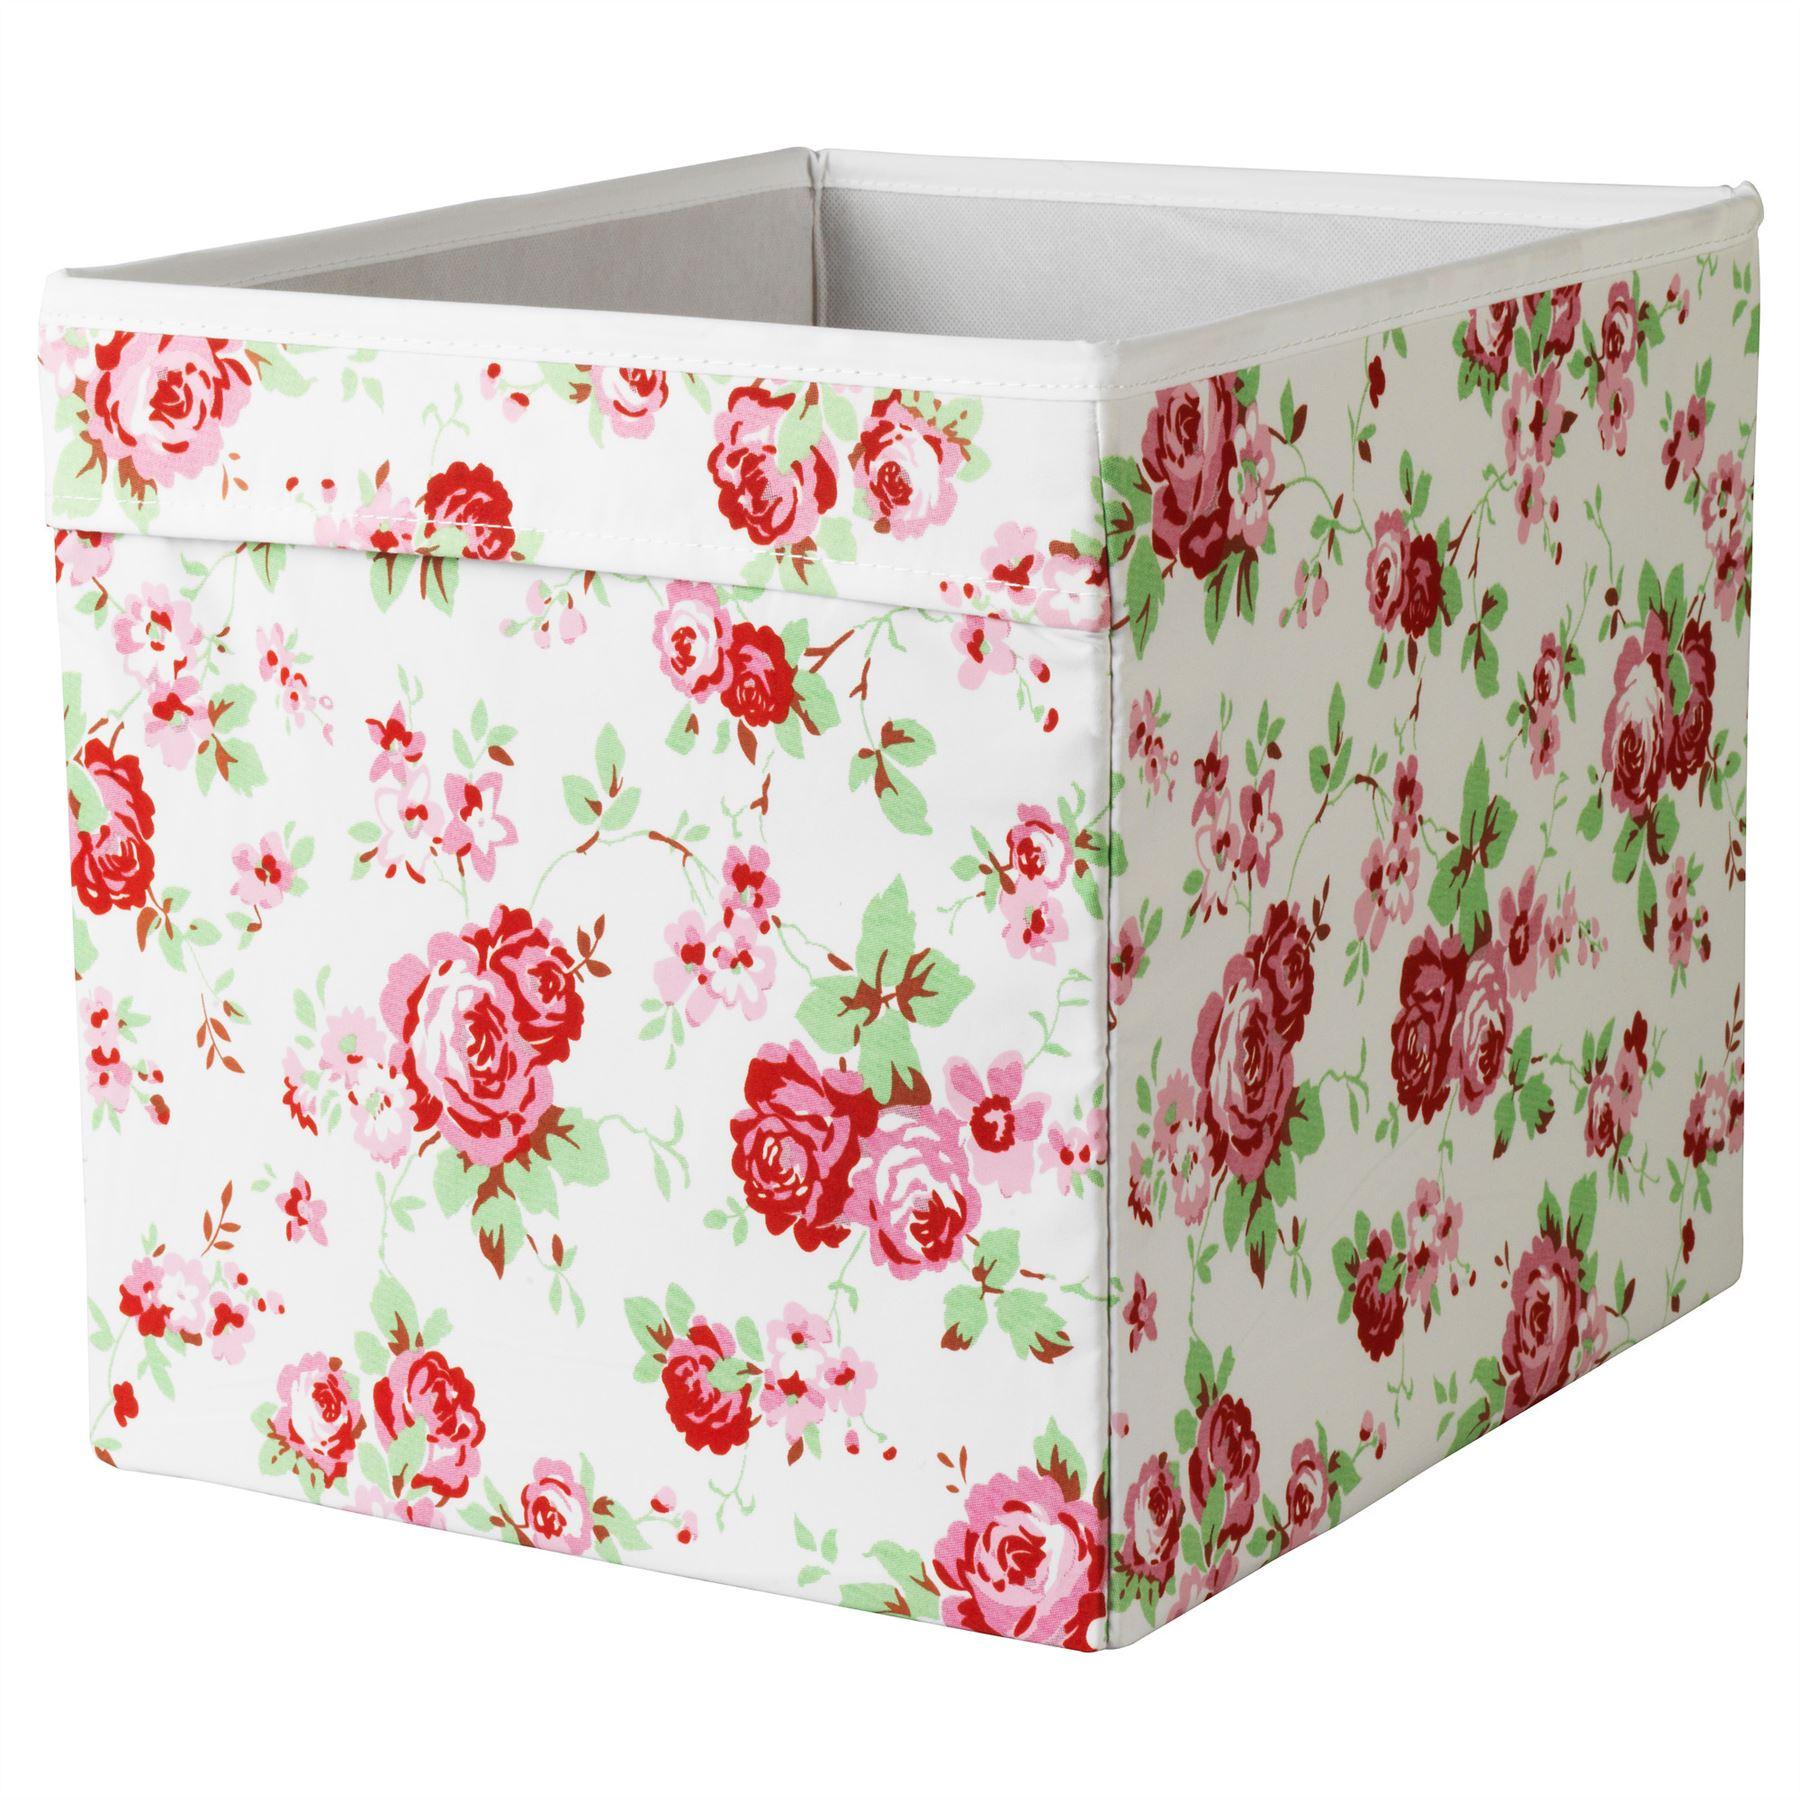 Ikea drona box storage fabric magazines books expedit for Fabric drawers ikea expedit